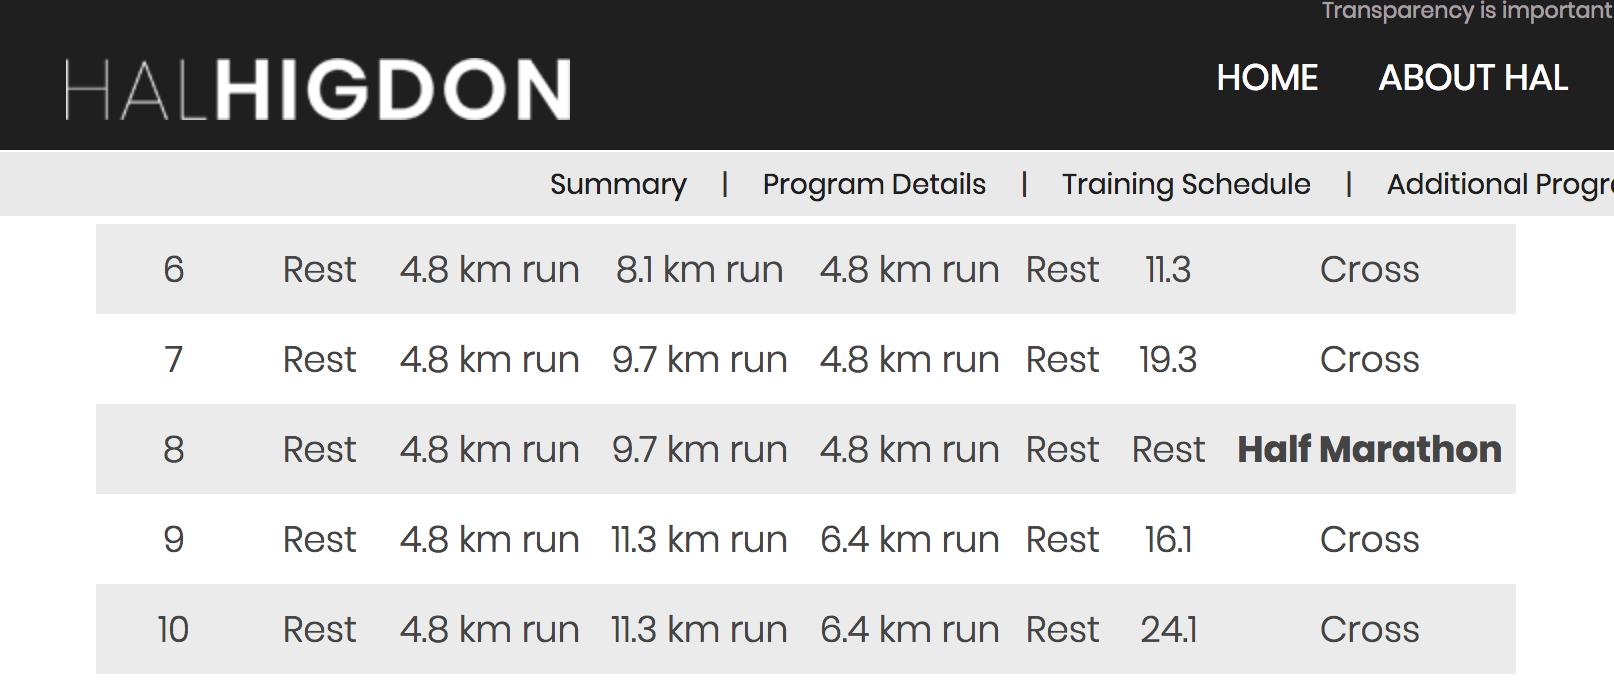 Hal Higdon marathon training